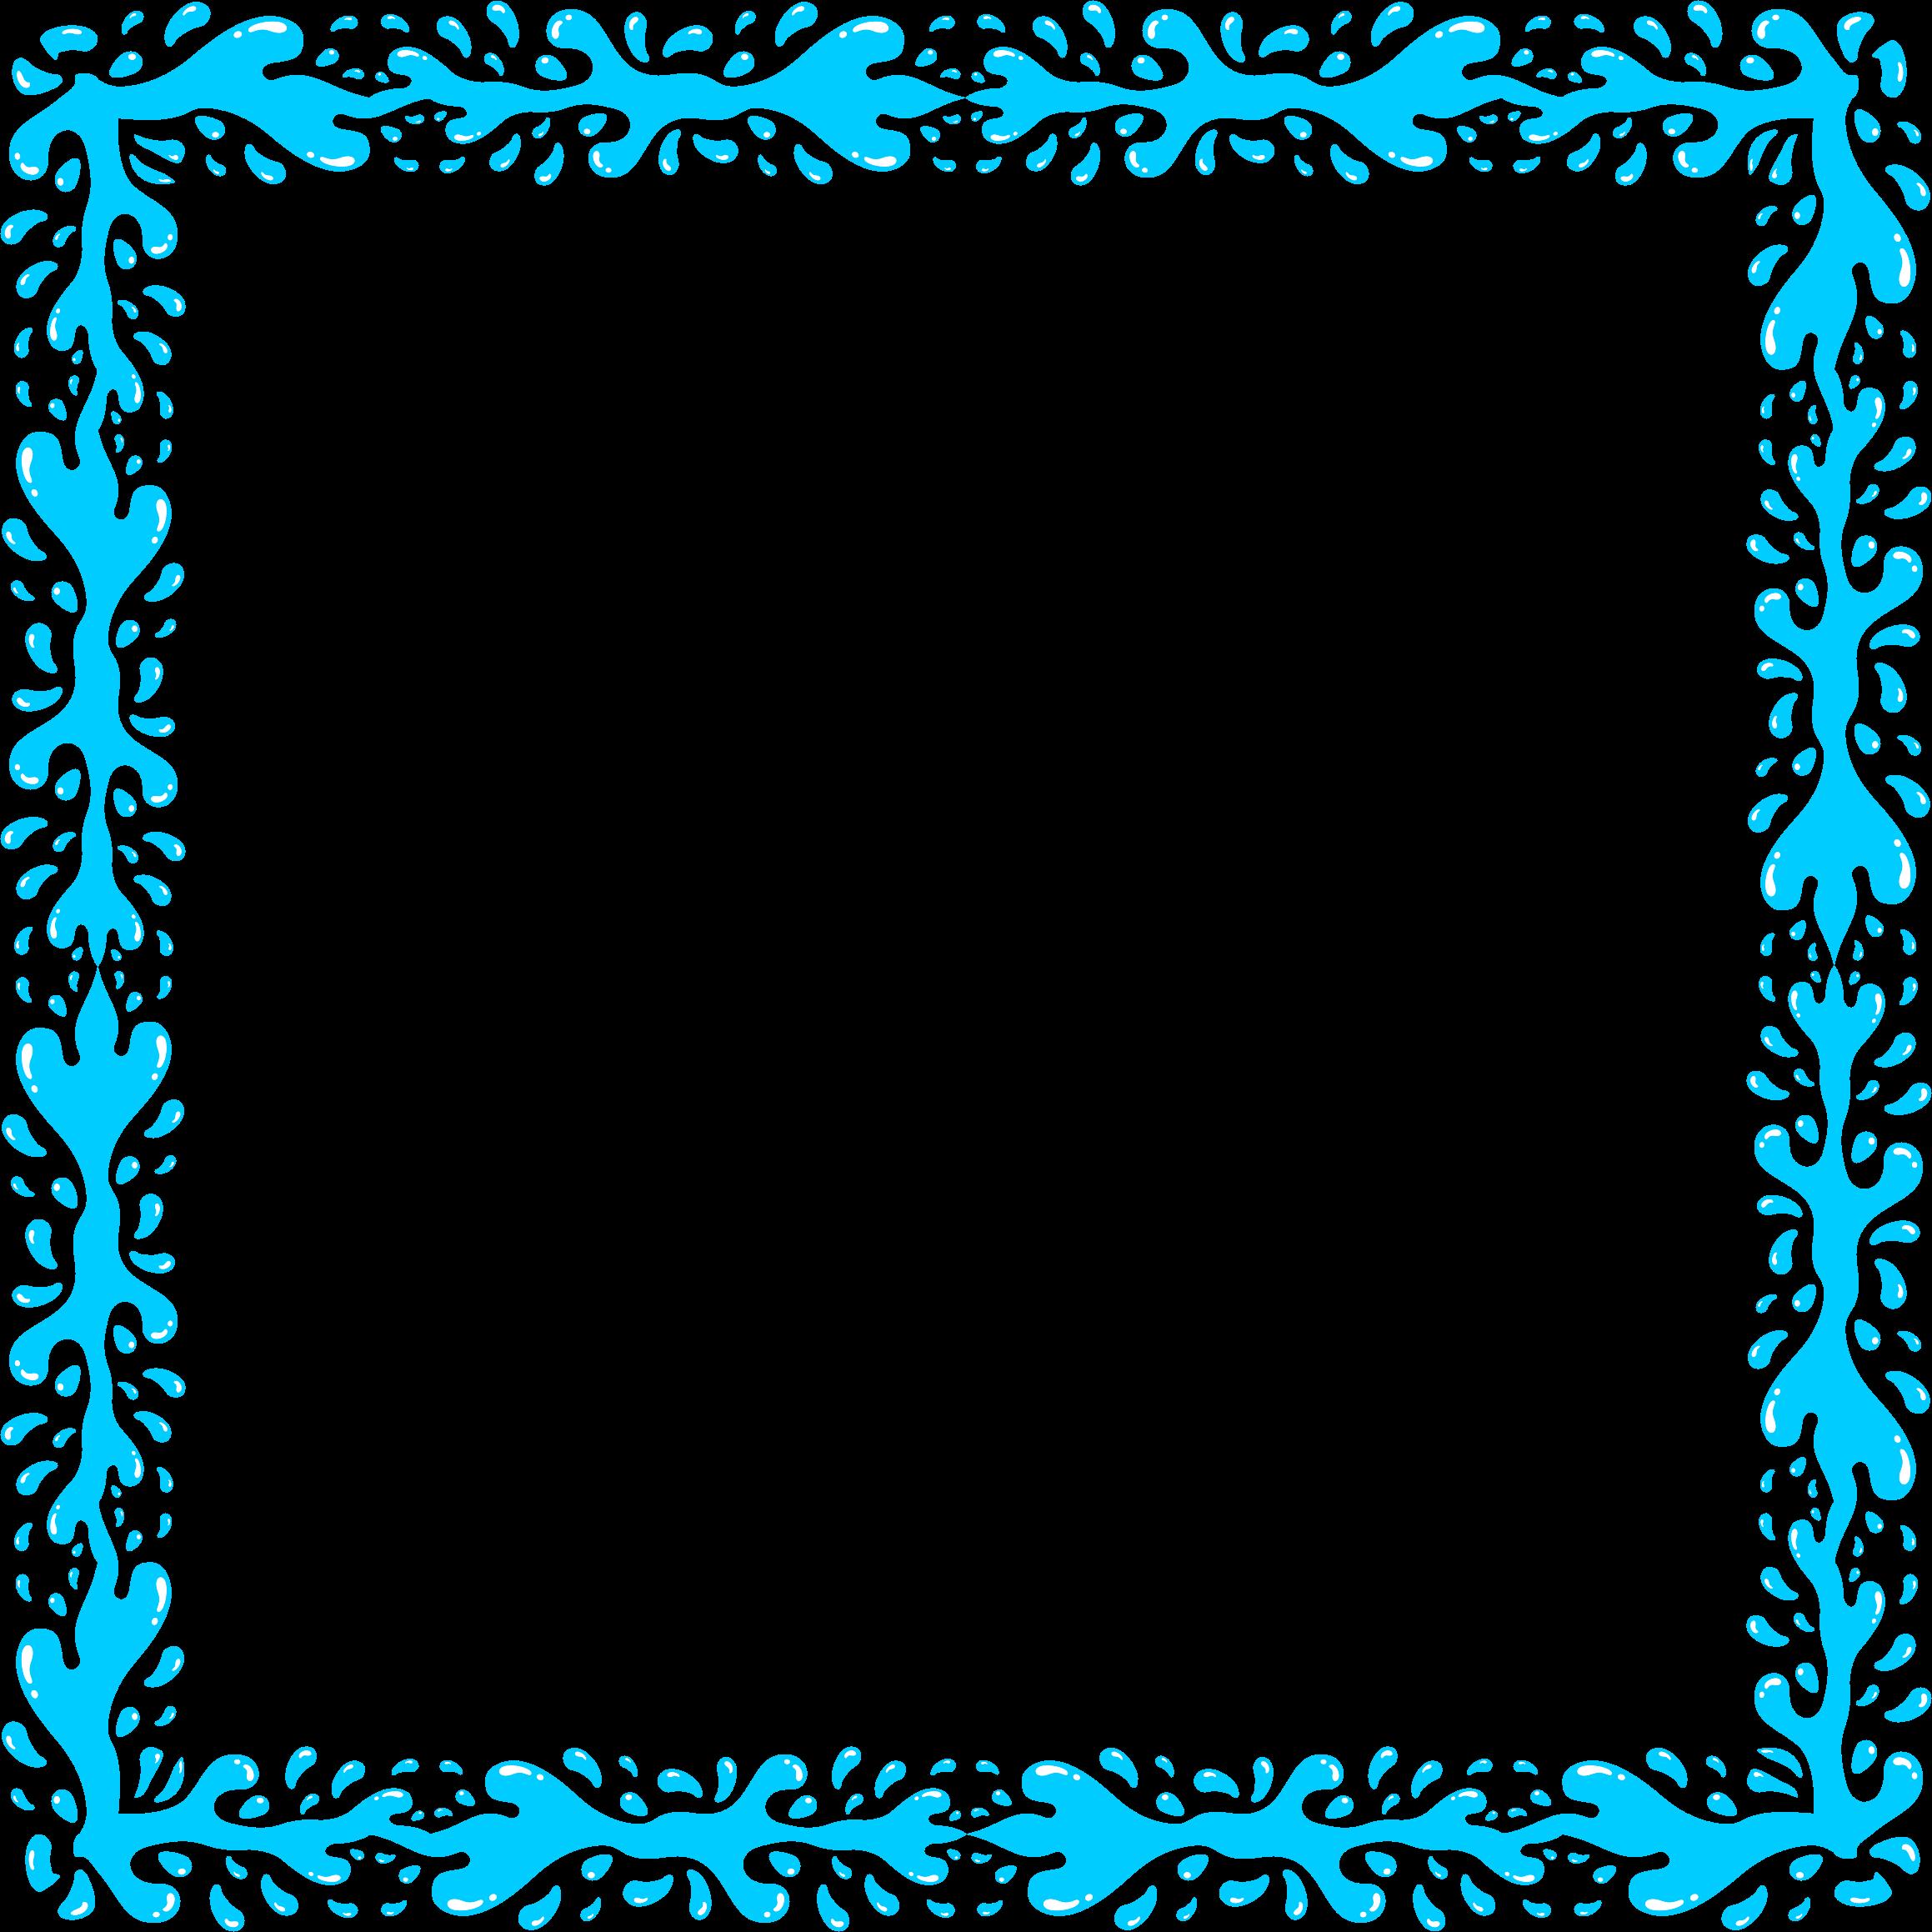 Snowflake border clipart free clip art royalty free Globe Clipart Border#3567670 clip art royalty free